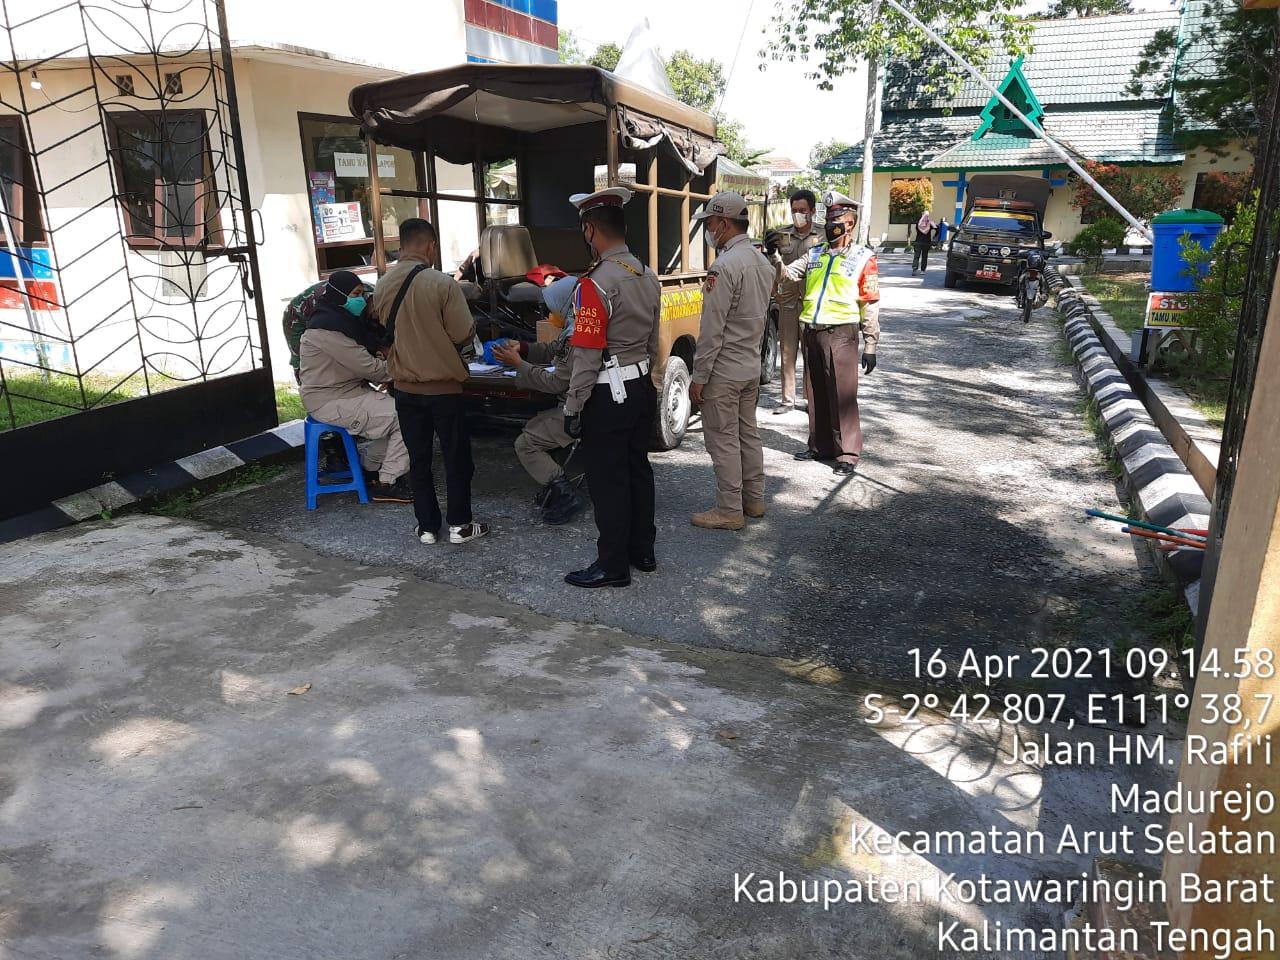 Polres Kobar laksanakan Ops Yustisi bersama TNI dan Satpol-PP guna mencegah penyebaran Covid-19